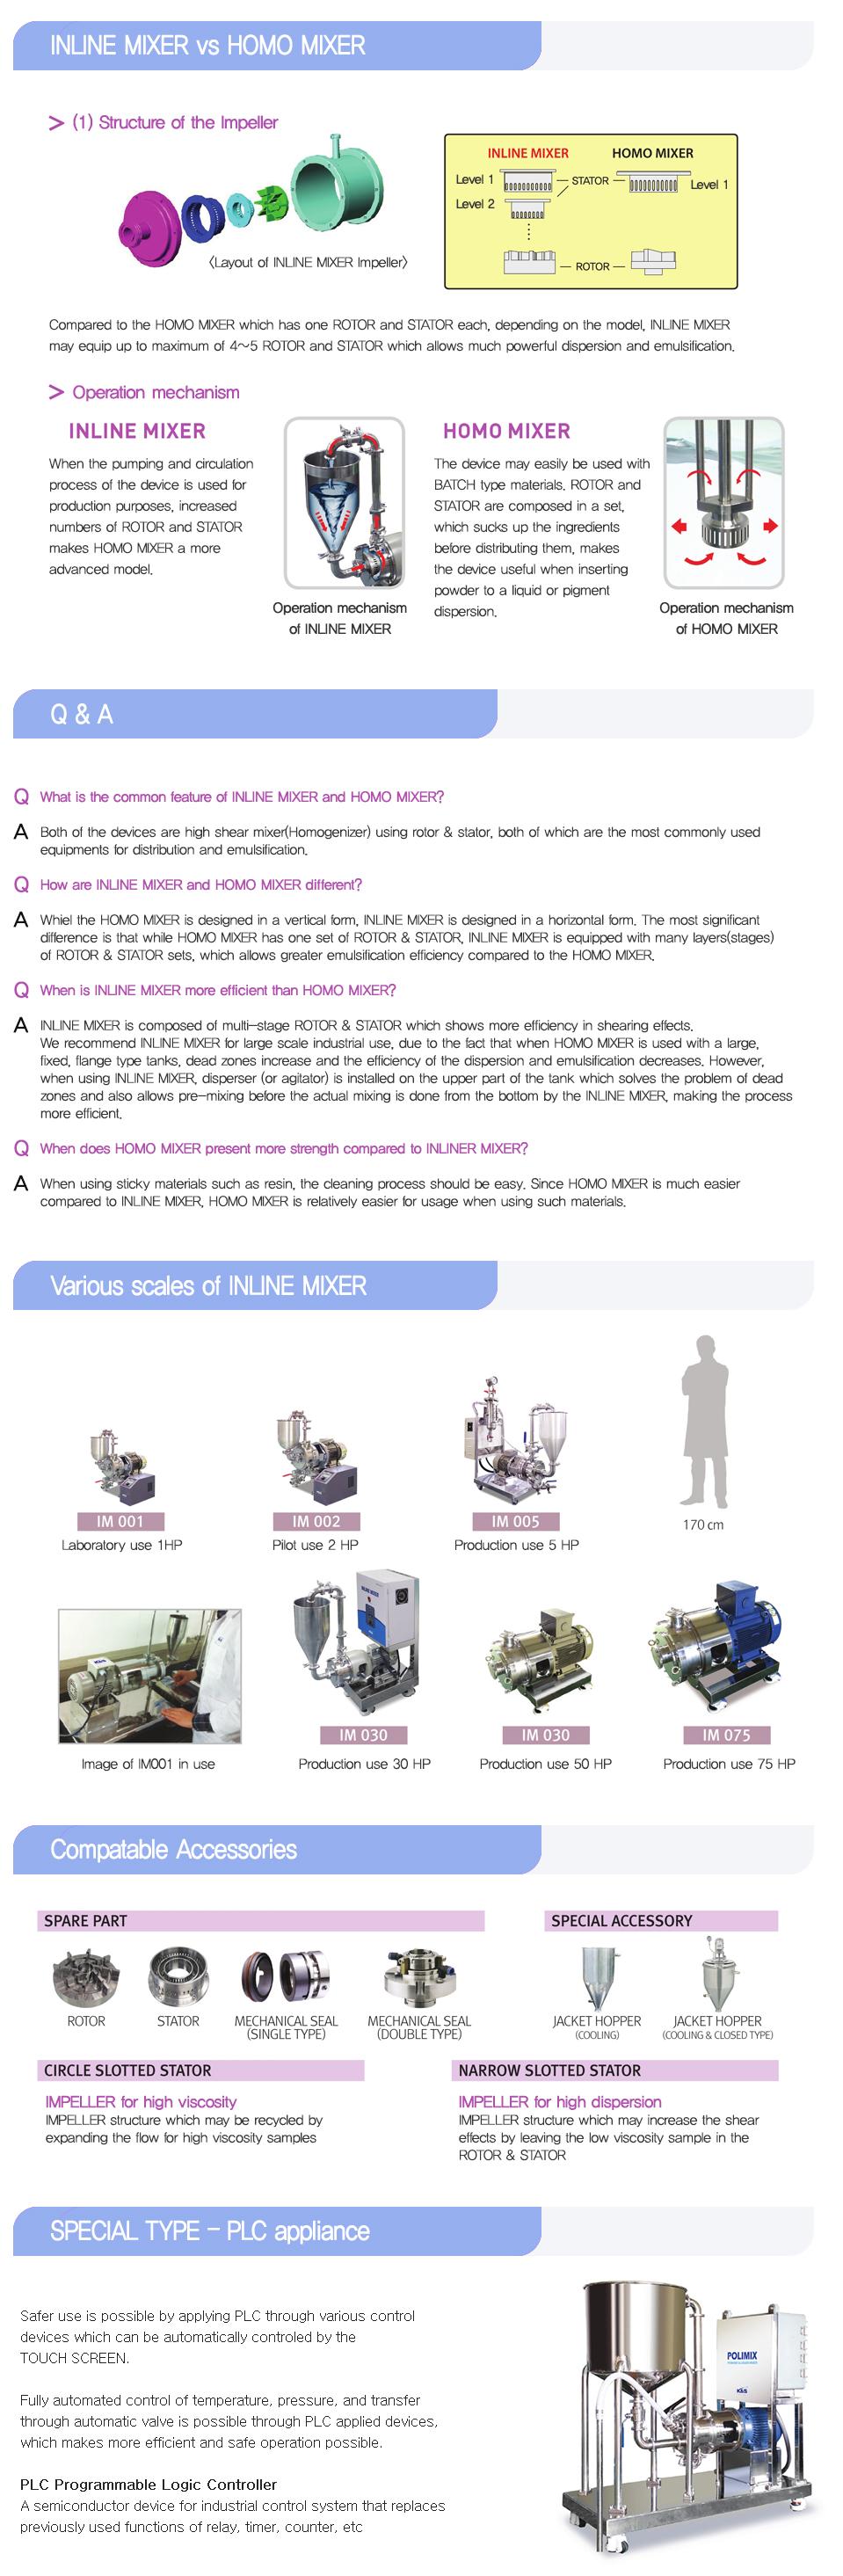 K&S Company HOMO MIXER (Batch Type Mixer for Homogenizing) HM-Series 1